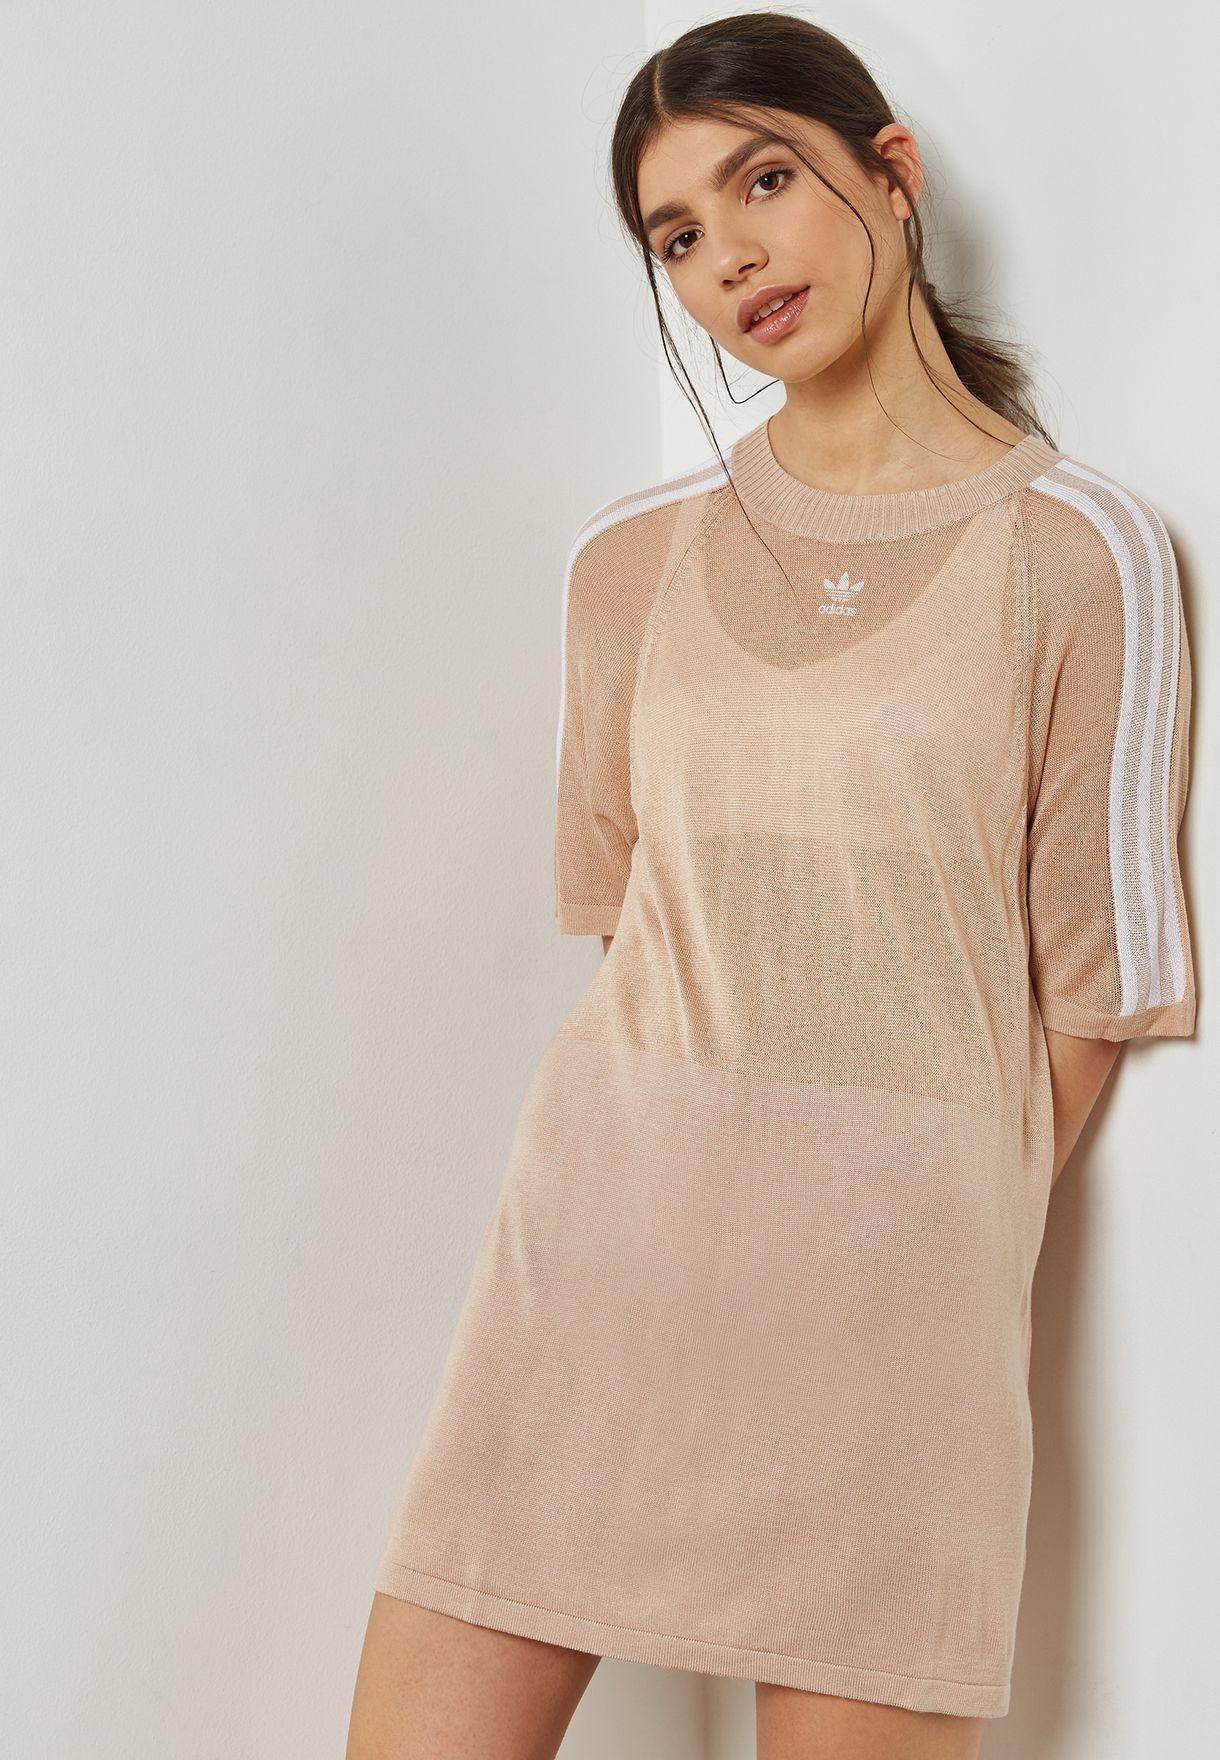 9275be3835 Shop adidas Originals beige 3 Stripe Dress CY5844 for Women in UAE ...